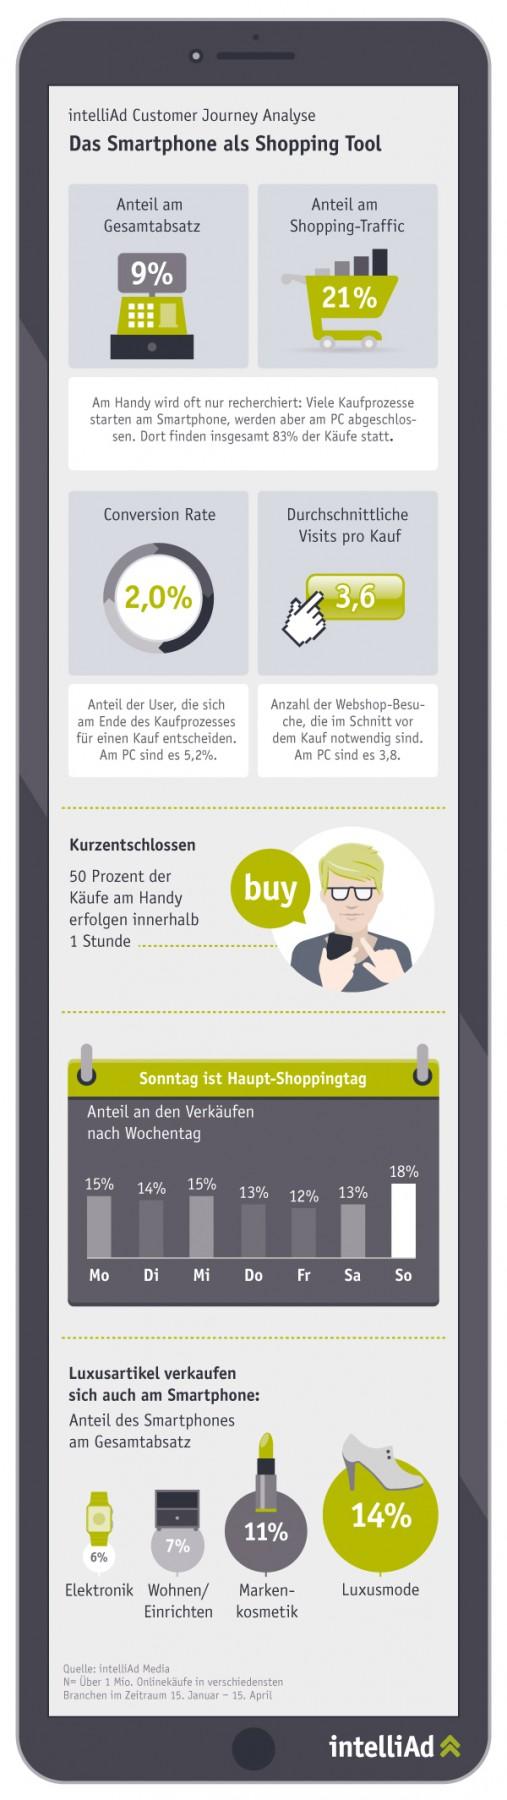 http://www.intelliad.de/wp-content/uploads/2015/08/intelliAd_infografik_smartphone_rgb.jpg